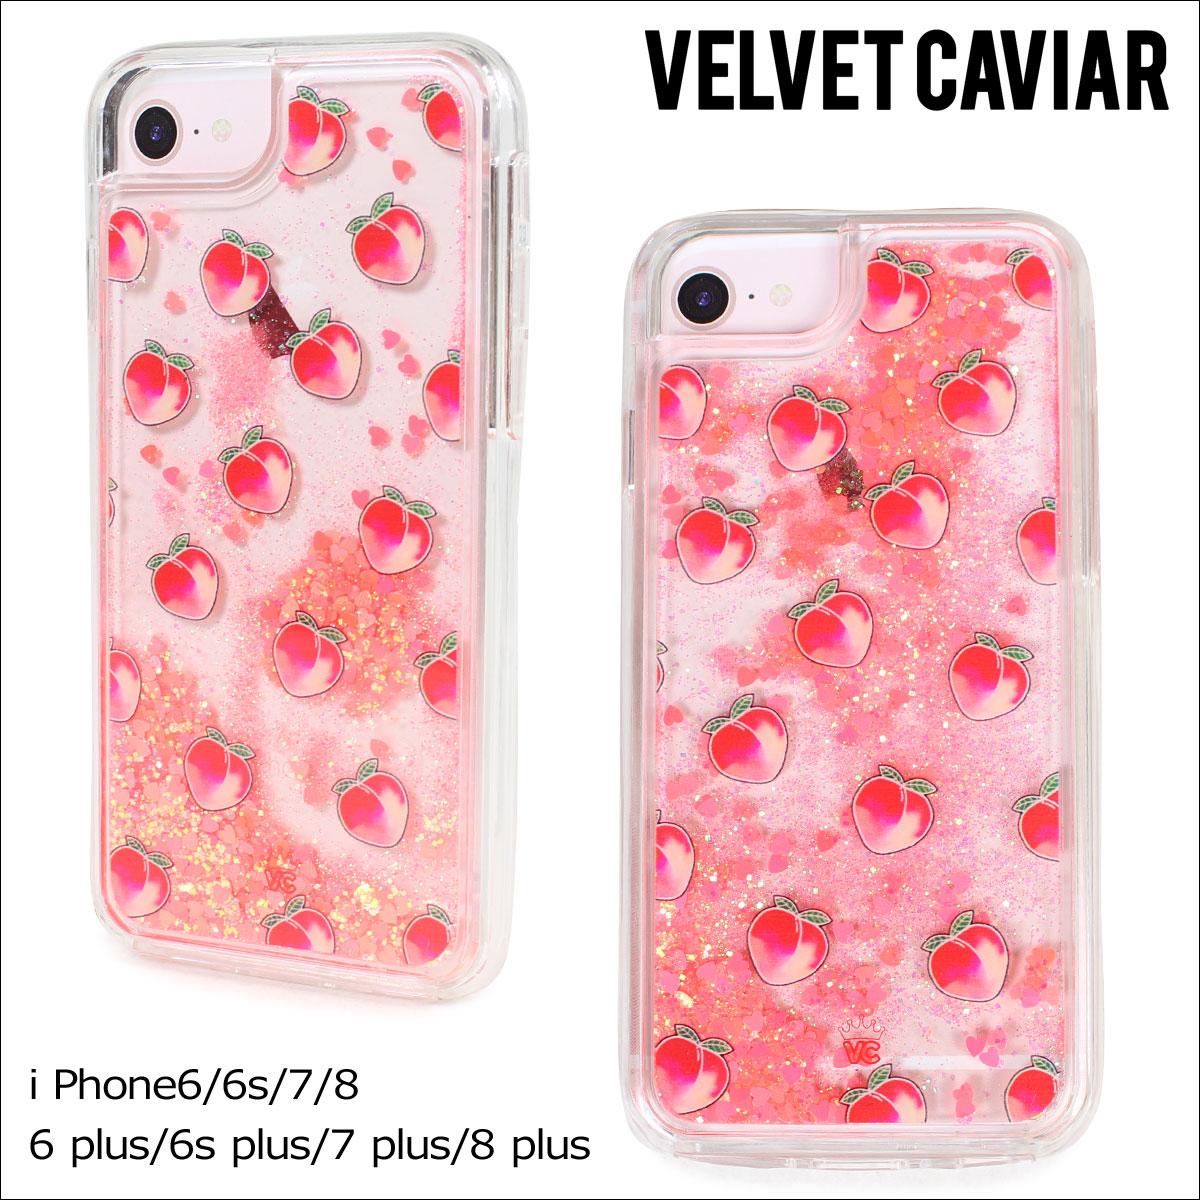 Velvet Caviar ヴェルヴェット キャビア iPhone8 SE iPhone 7 8 Plus 7Plus 6s 6 ケース スマホ 携帯 アイフォン アイフォーン ベルベッ